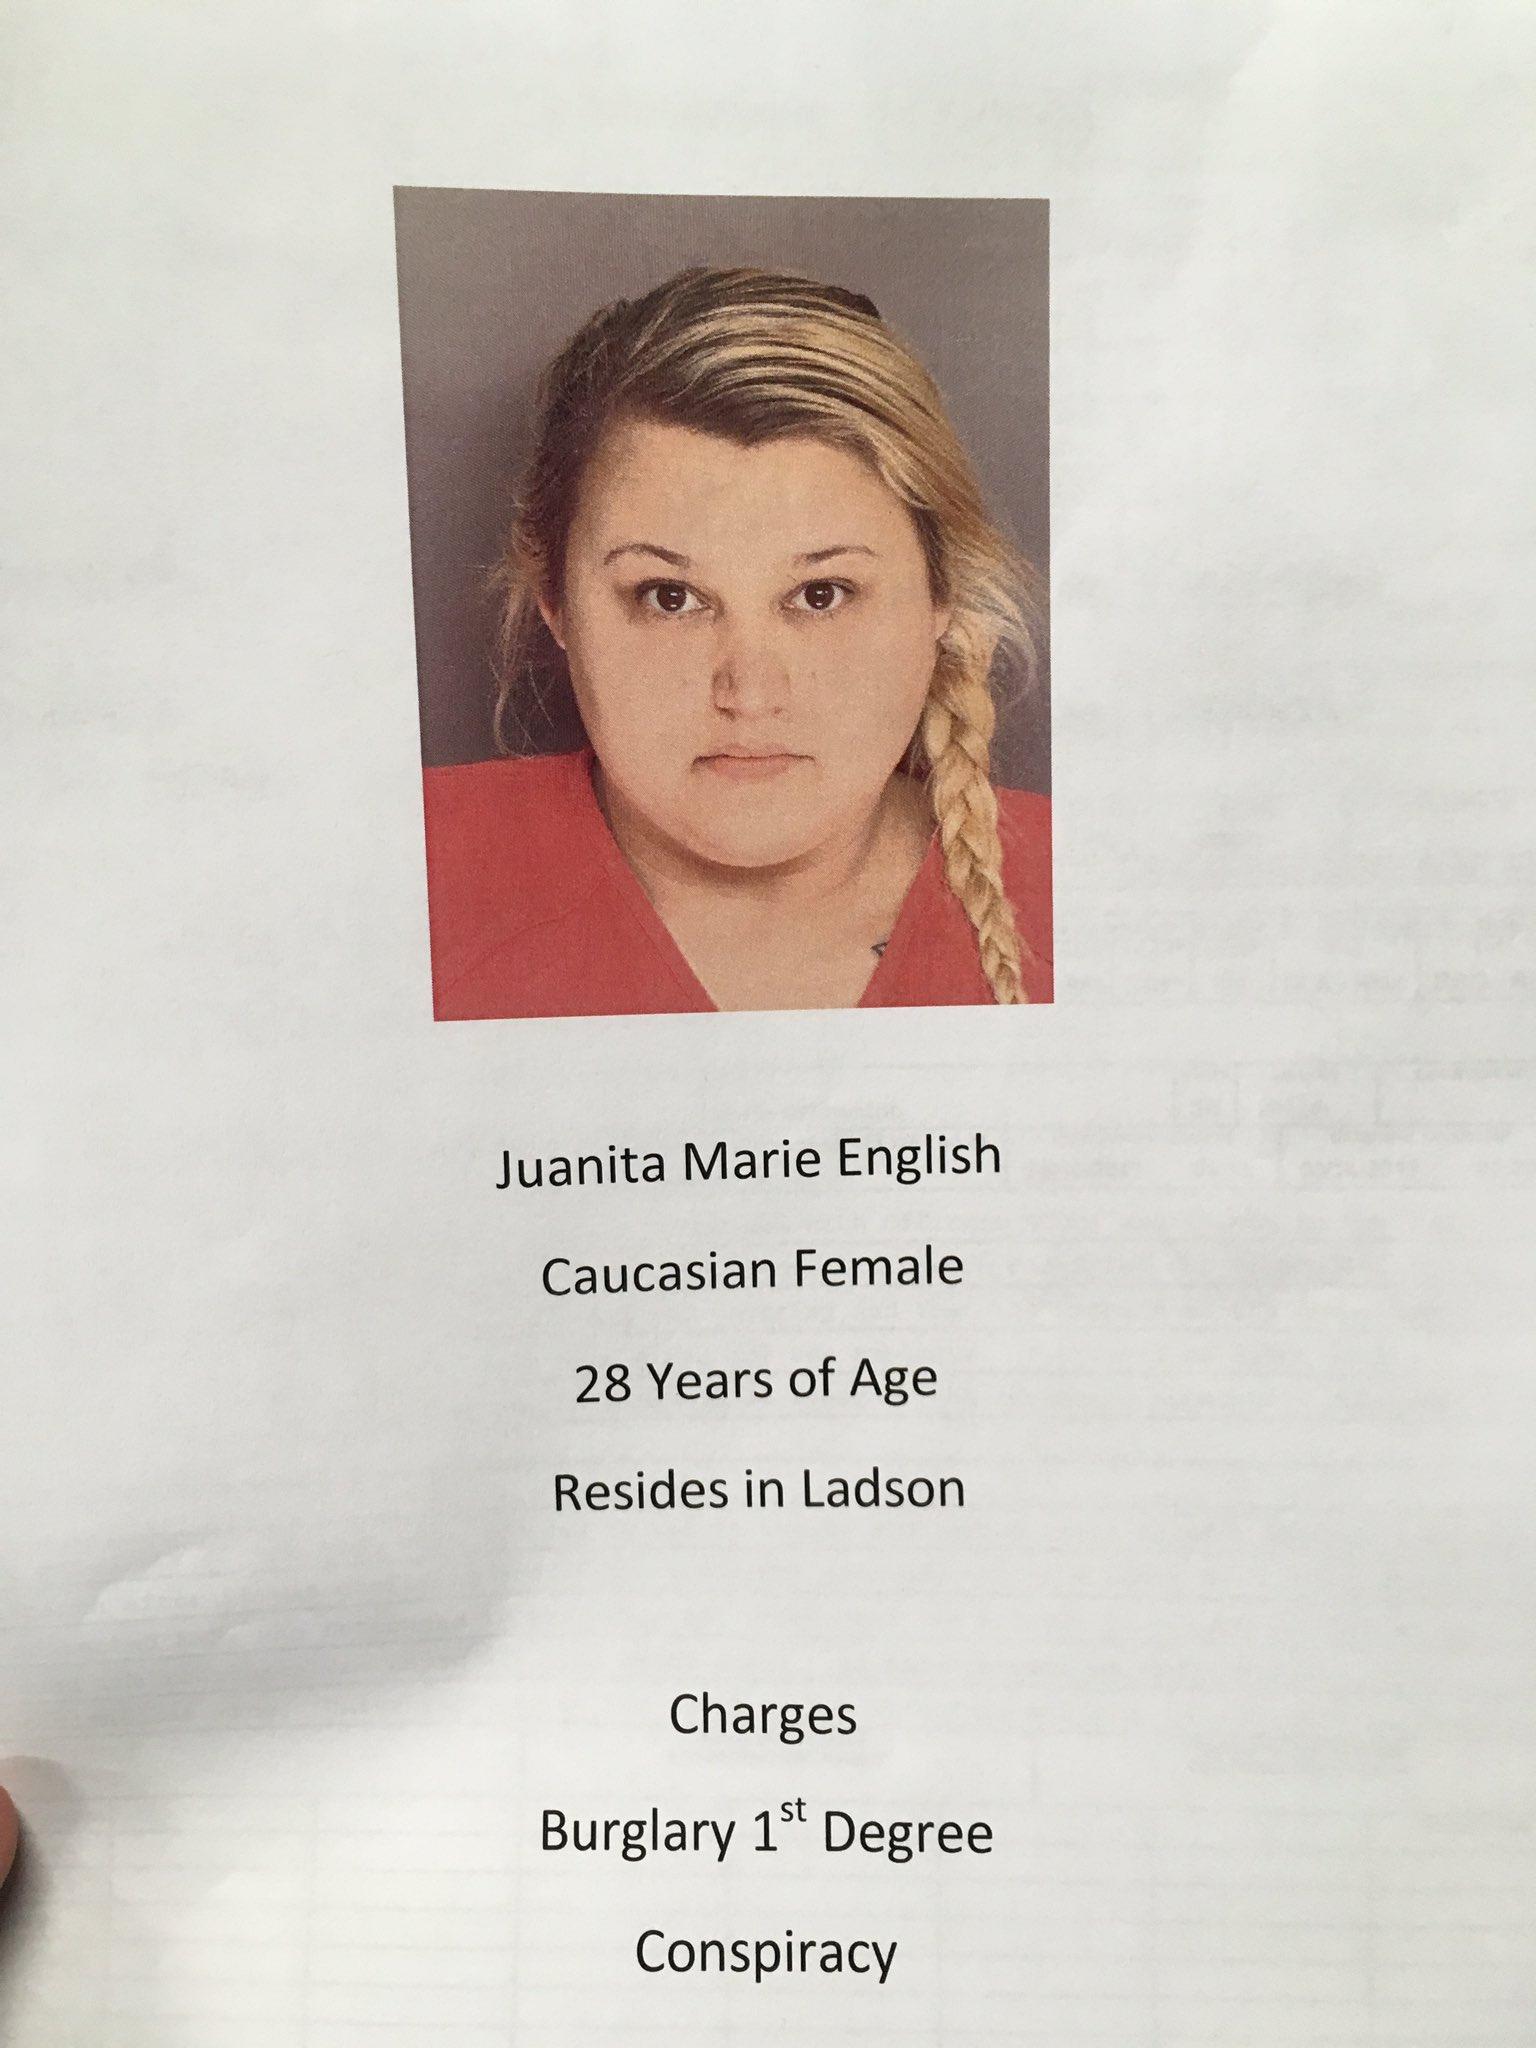 Ollic says Juanita English has been charged w/ burglary 1st degree & conspiracy. Went to door posing as an HOA member seeking info. #chsnews https://t.co/PikvX0tgCC